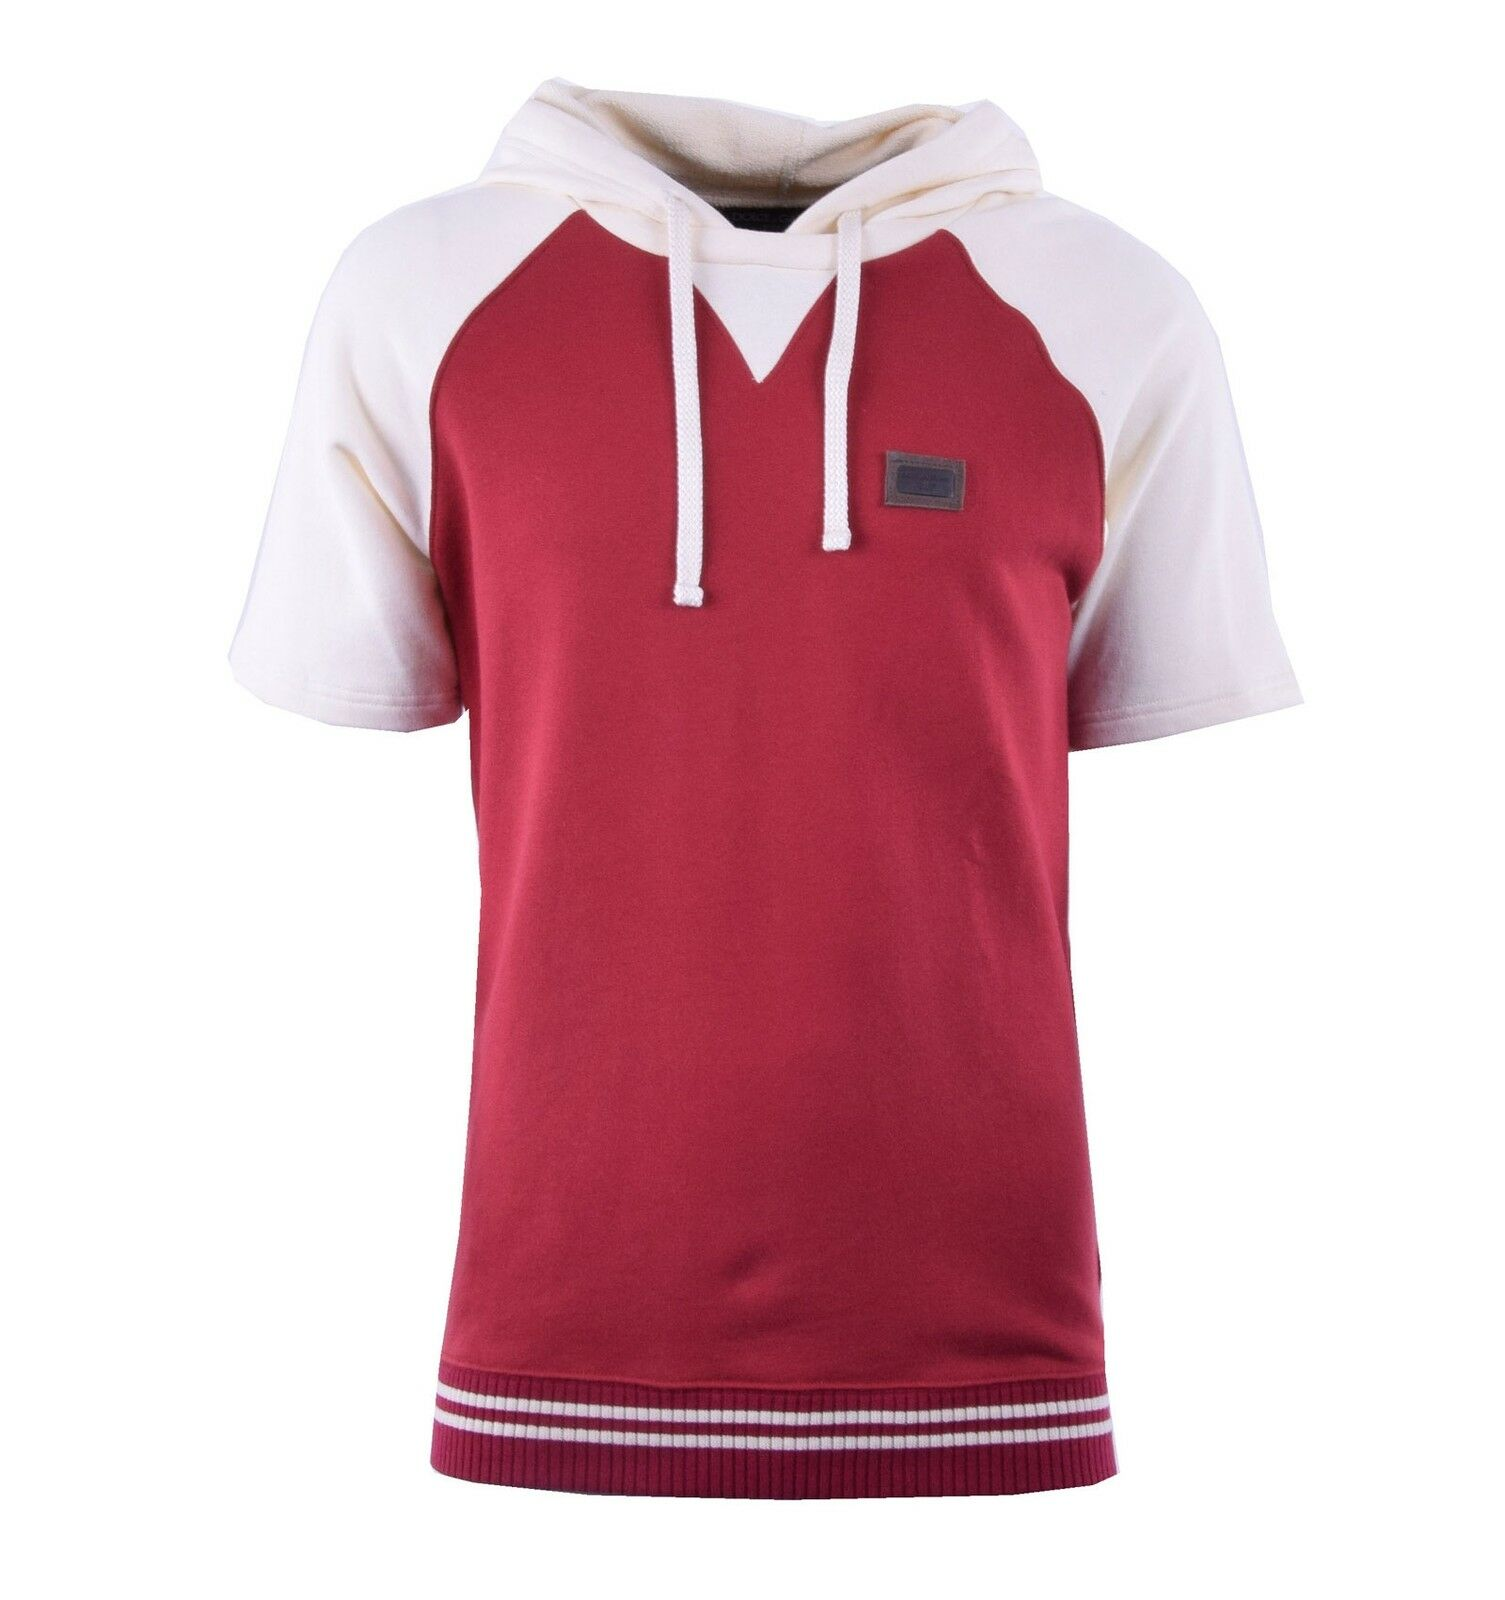 DOLCE & GABBANA Logo T-Shirt mit Kapuze Rot Weiß Hoody ROT Weiß 04231